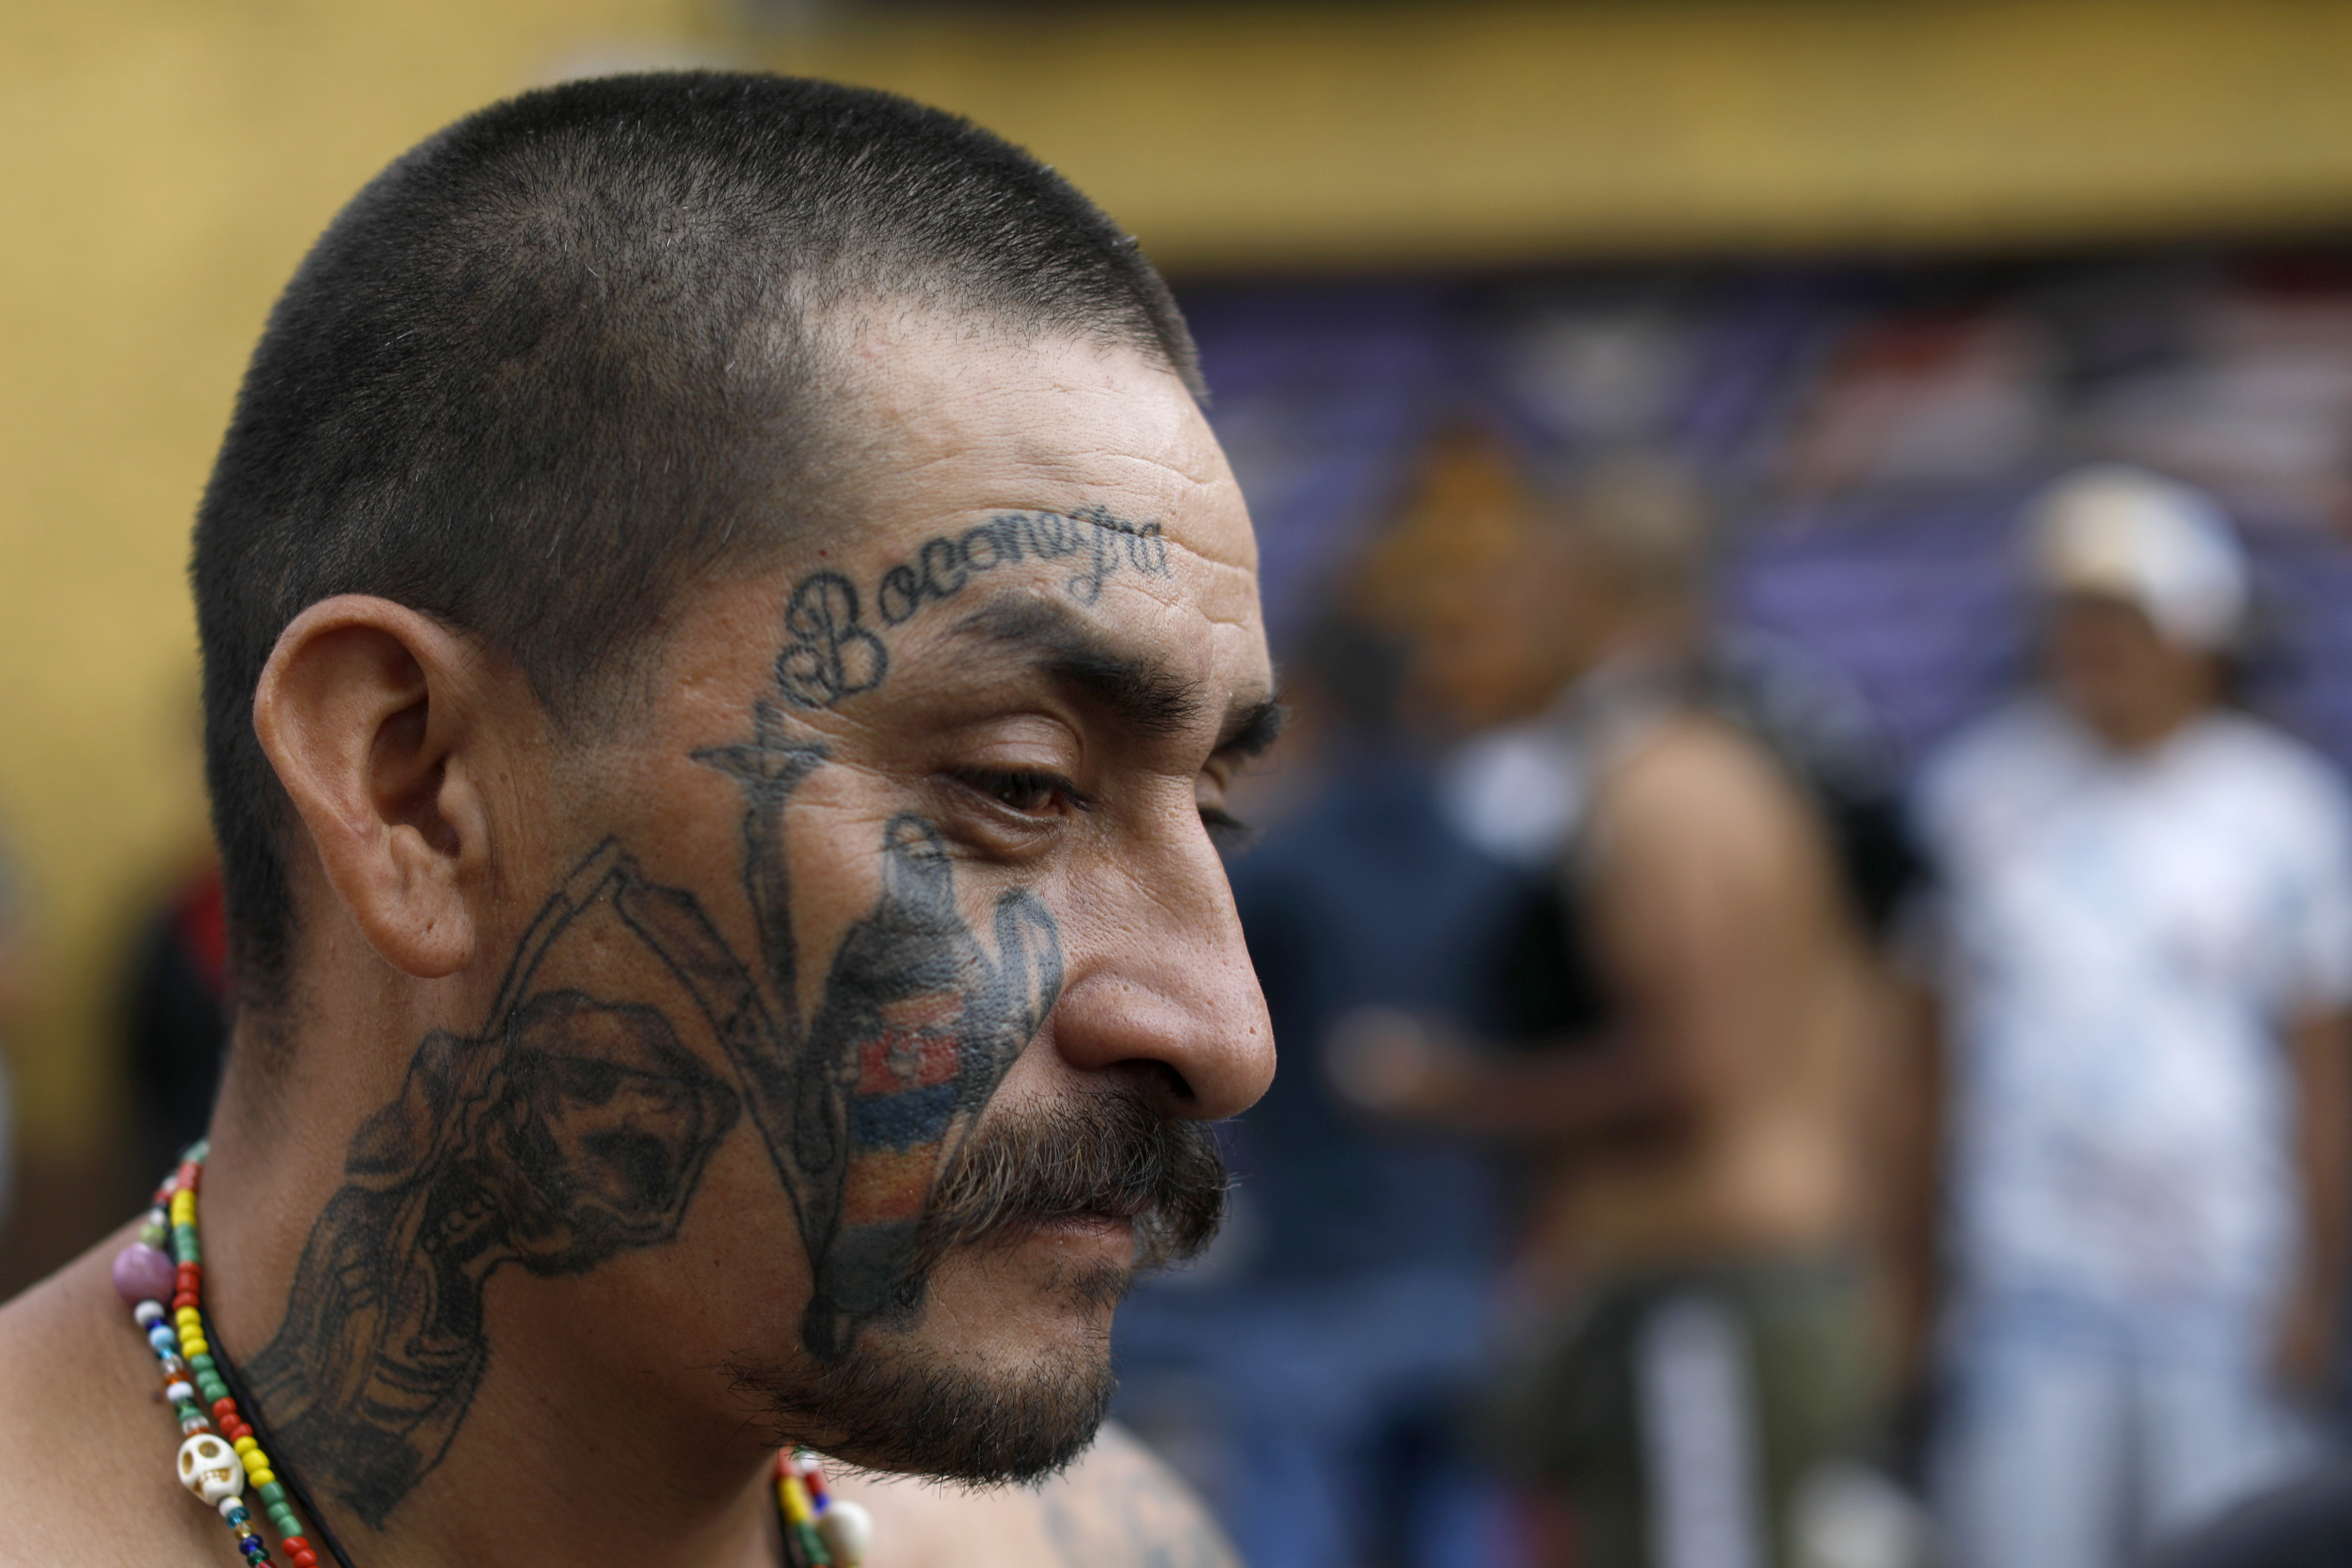 Luis Alberto Paletas, 43. (Foto: AP / Rebecca Blackwell)